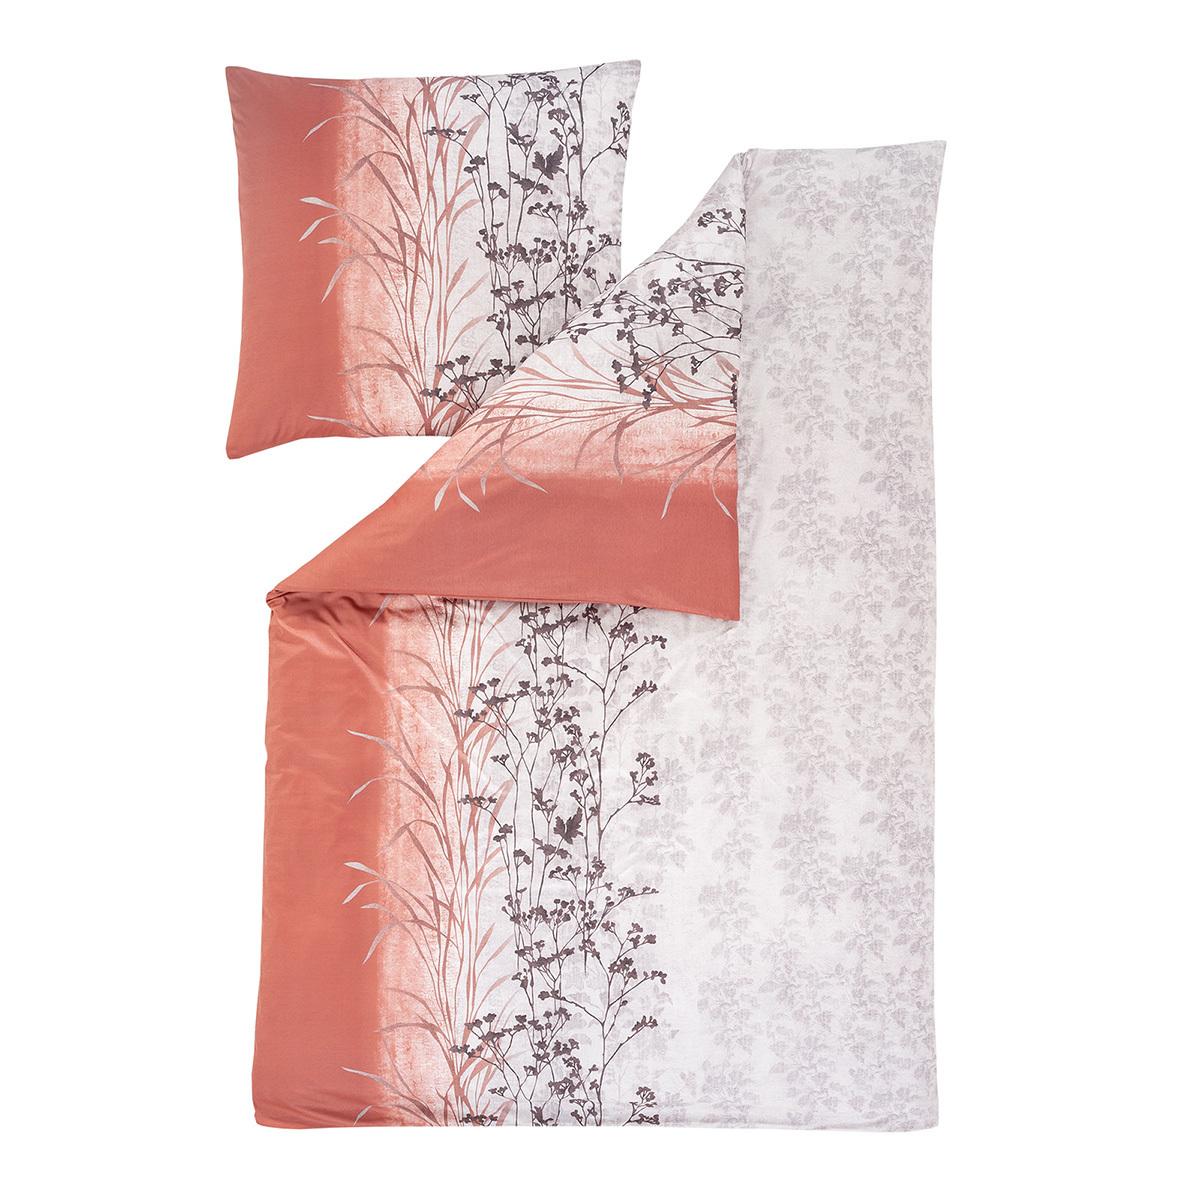 estella mako interlock jersey bettw sche ava mahagoni g nstig online kaufen bei bettwaren shop. Black Bedroom Furniture Sets. Home Design Ideas